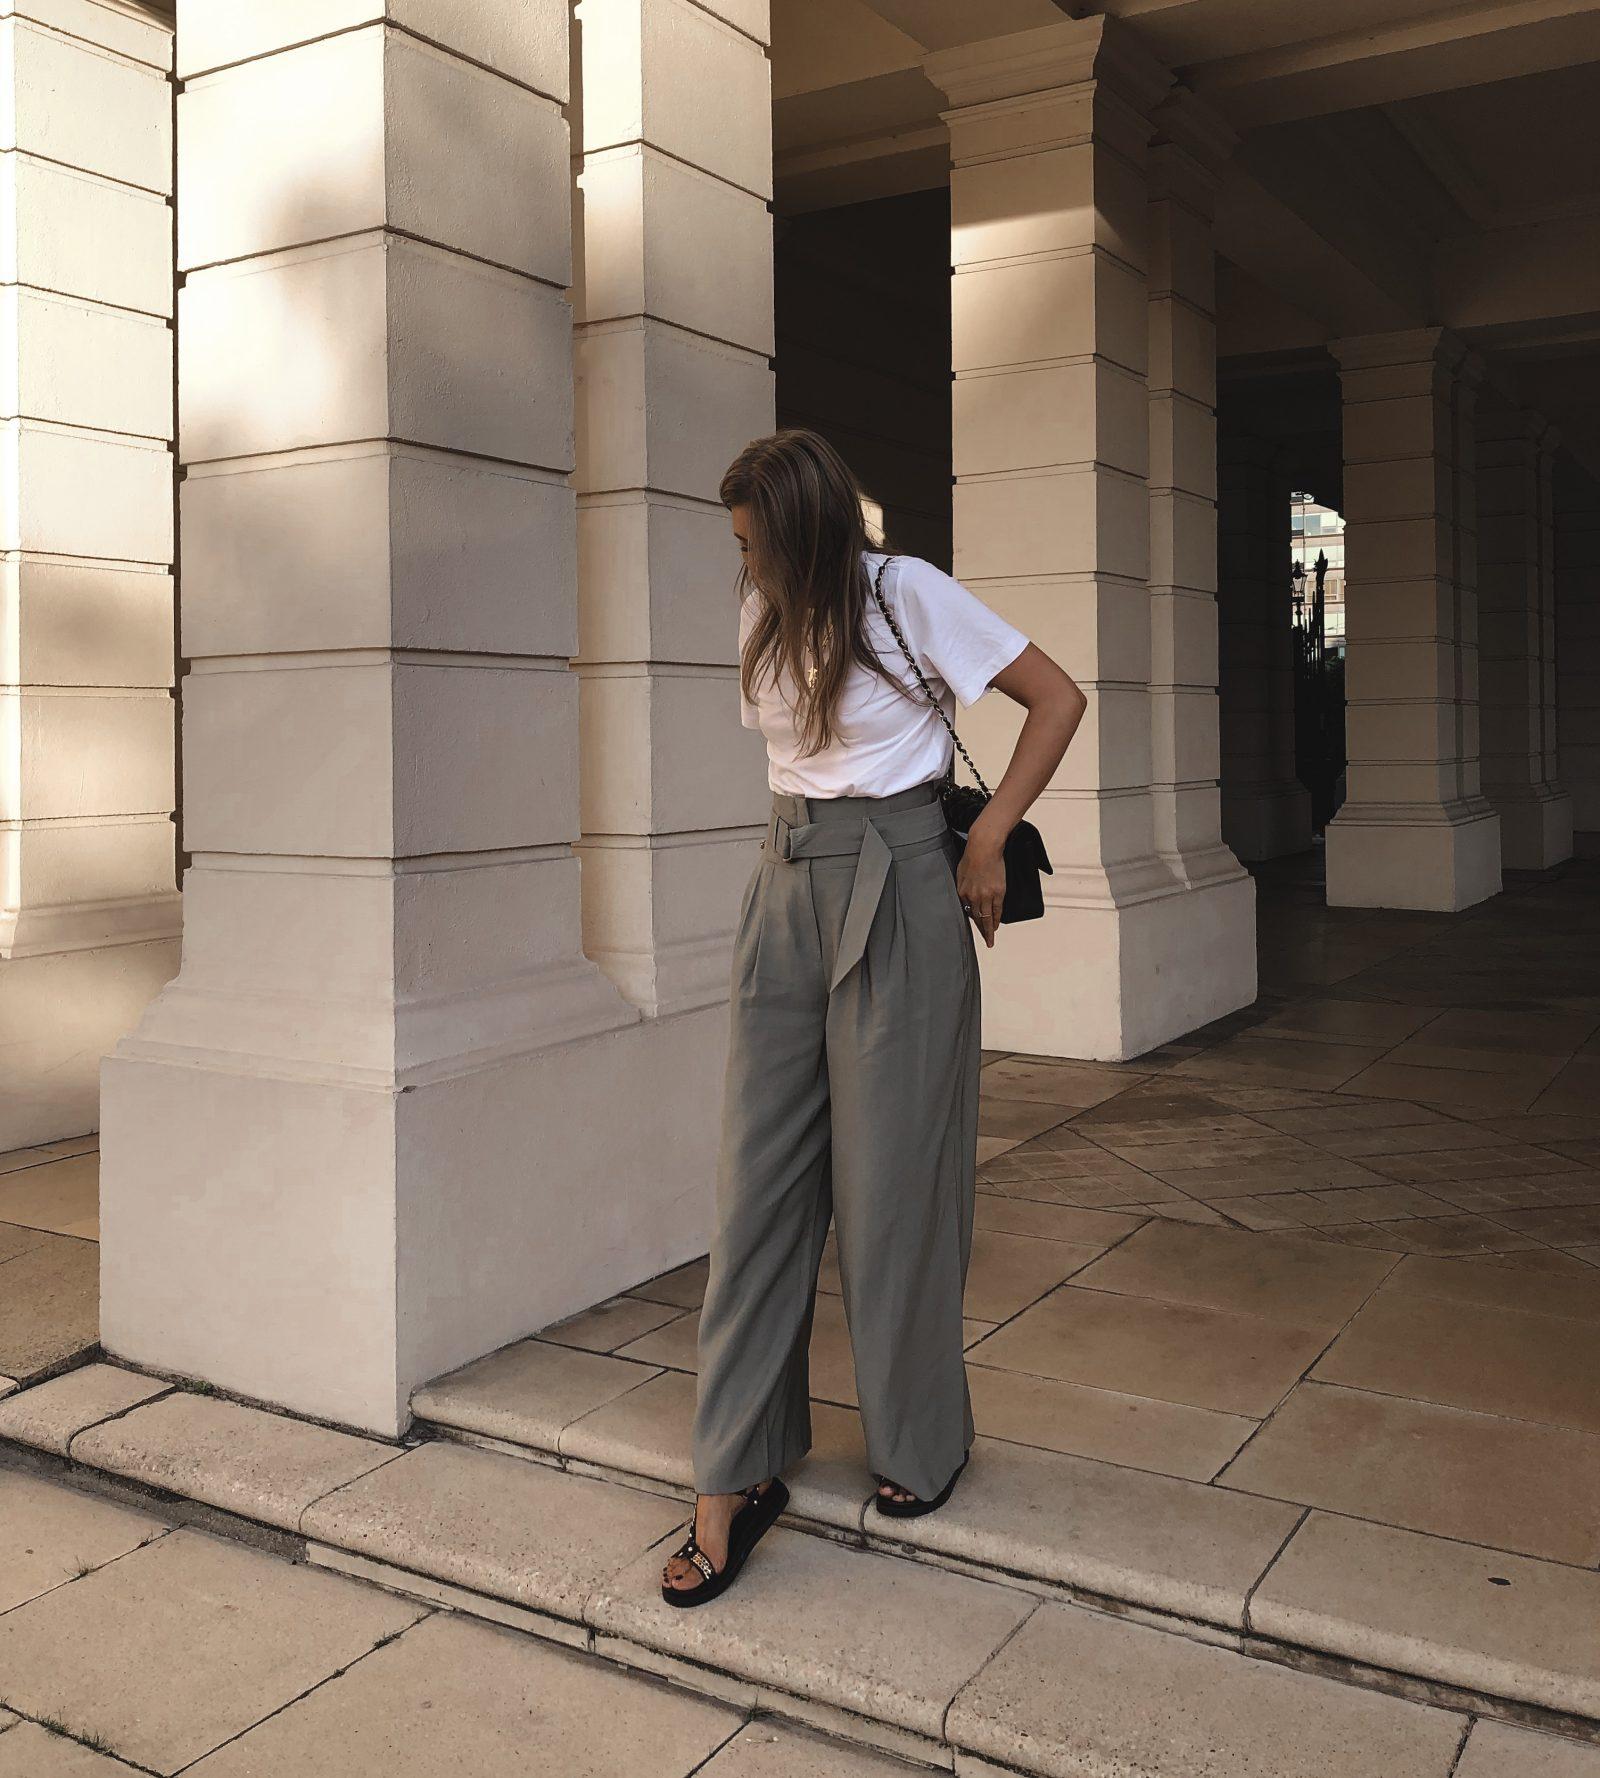 Autumn Topshop Haul - Topshop Khaki Wide Leg Trousers